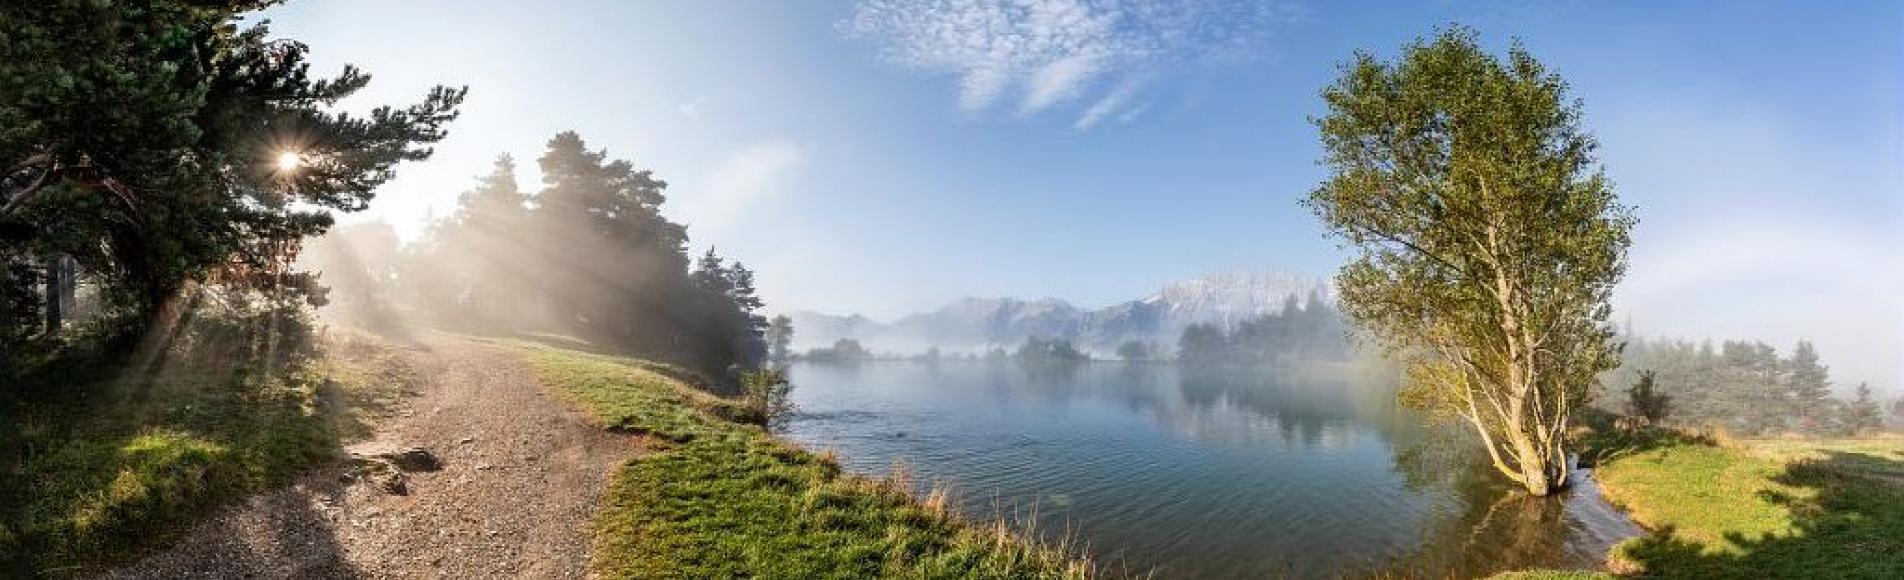 Lac de Roaffan - © T. Blais - PNE